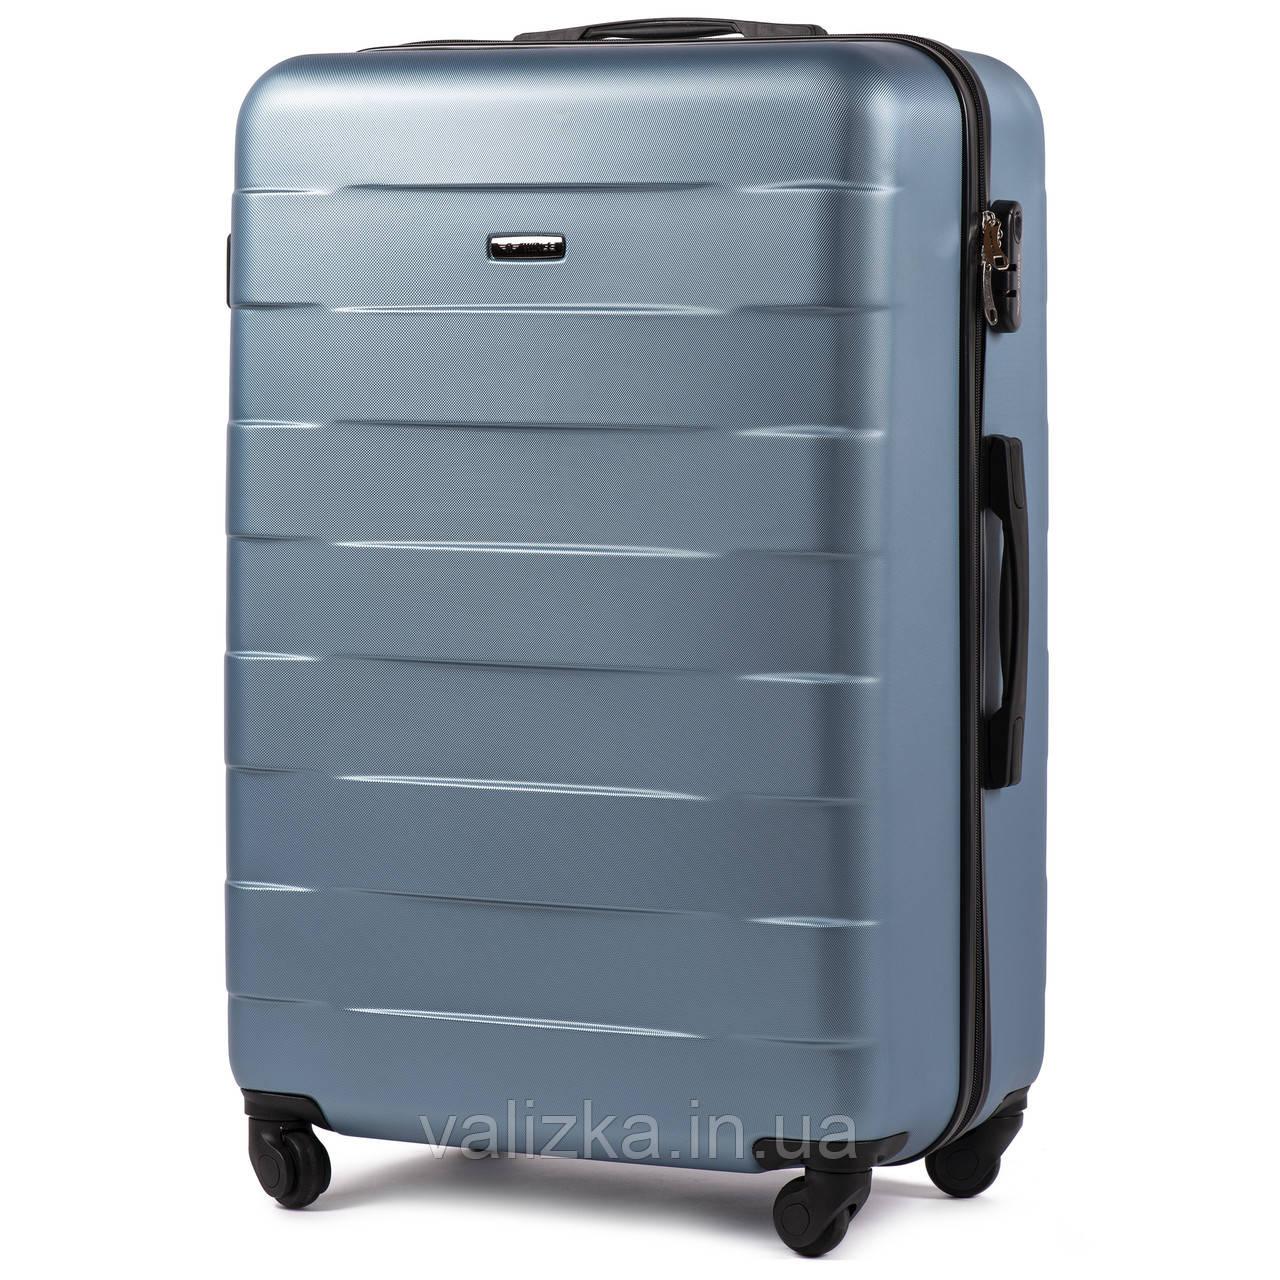 Большой пластиковый чемодан Wings 401 на 4-х колесах сильвер блу